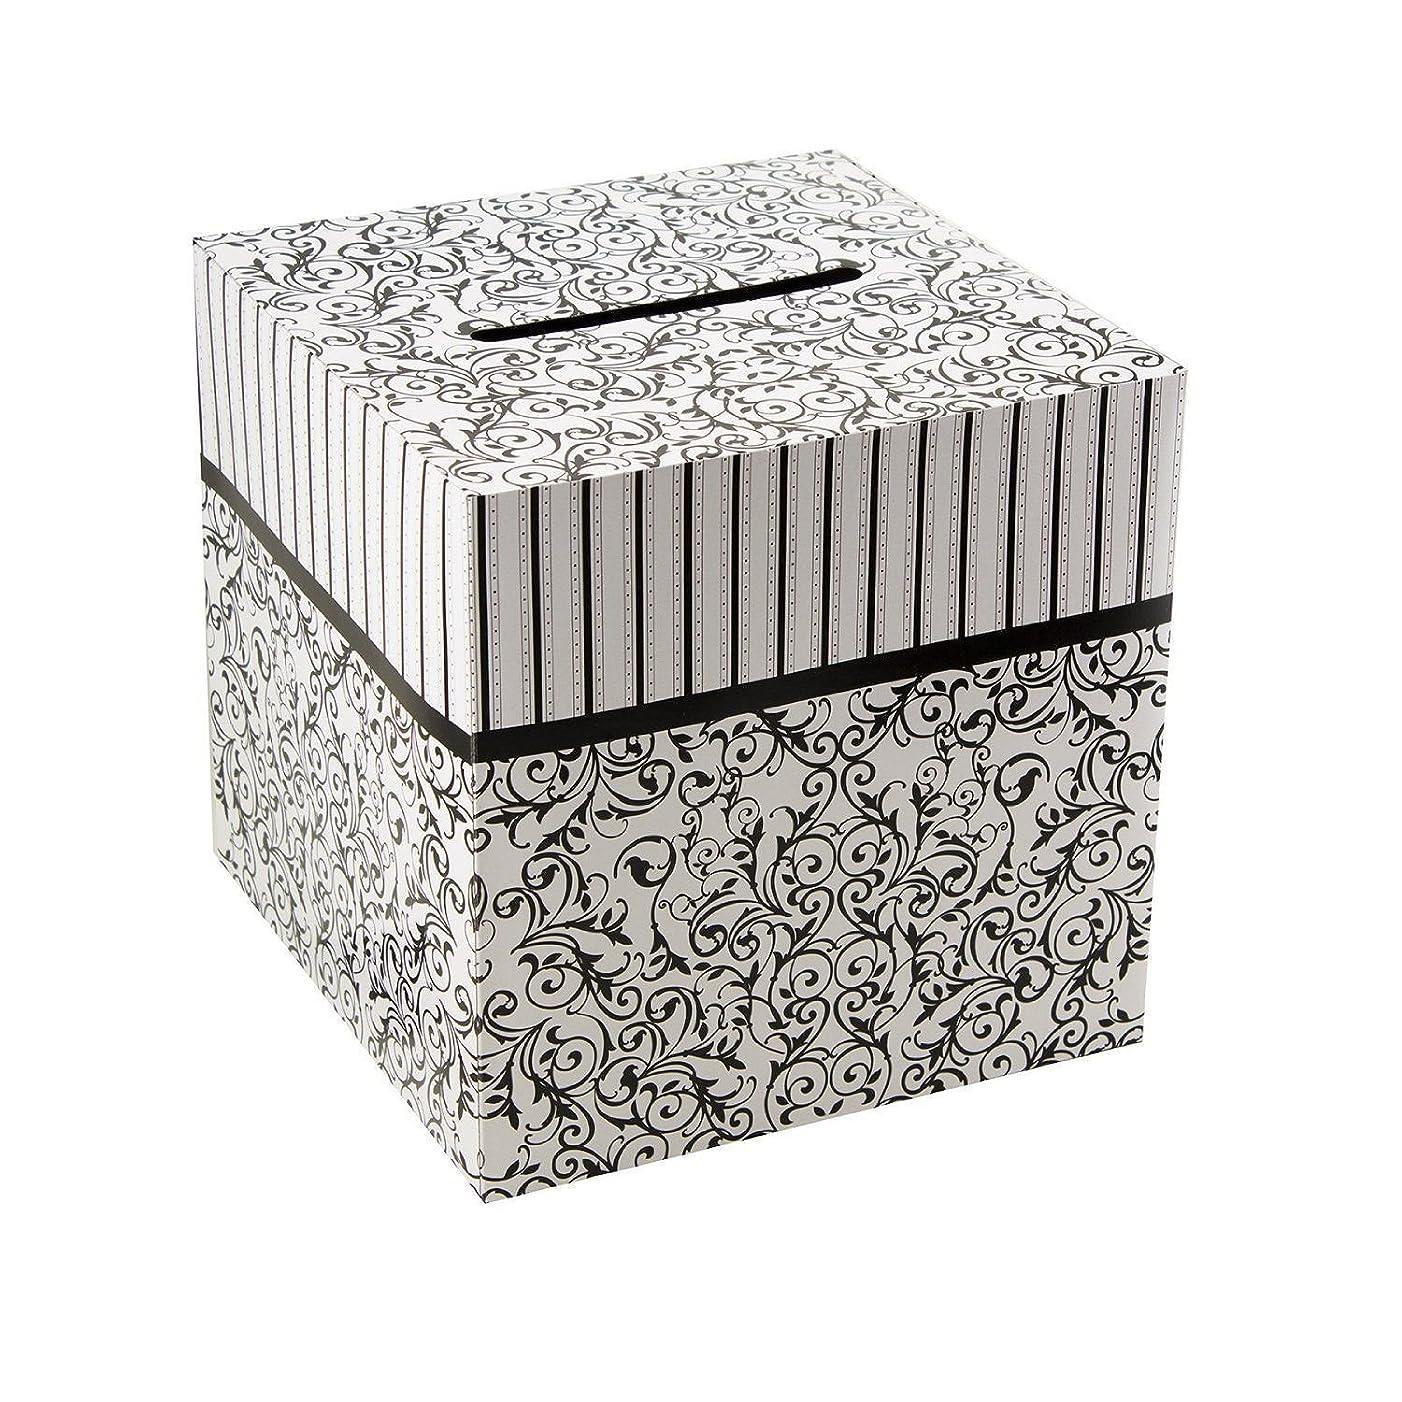 "Ifavor123 Cardboard Black and White 10"" X 10"" Wedding Birthday Party Gift Money Card Box"